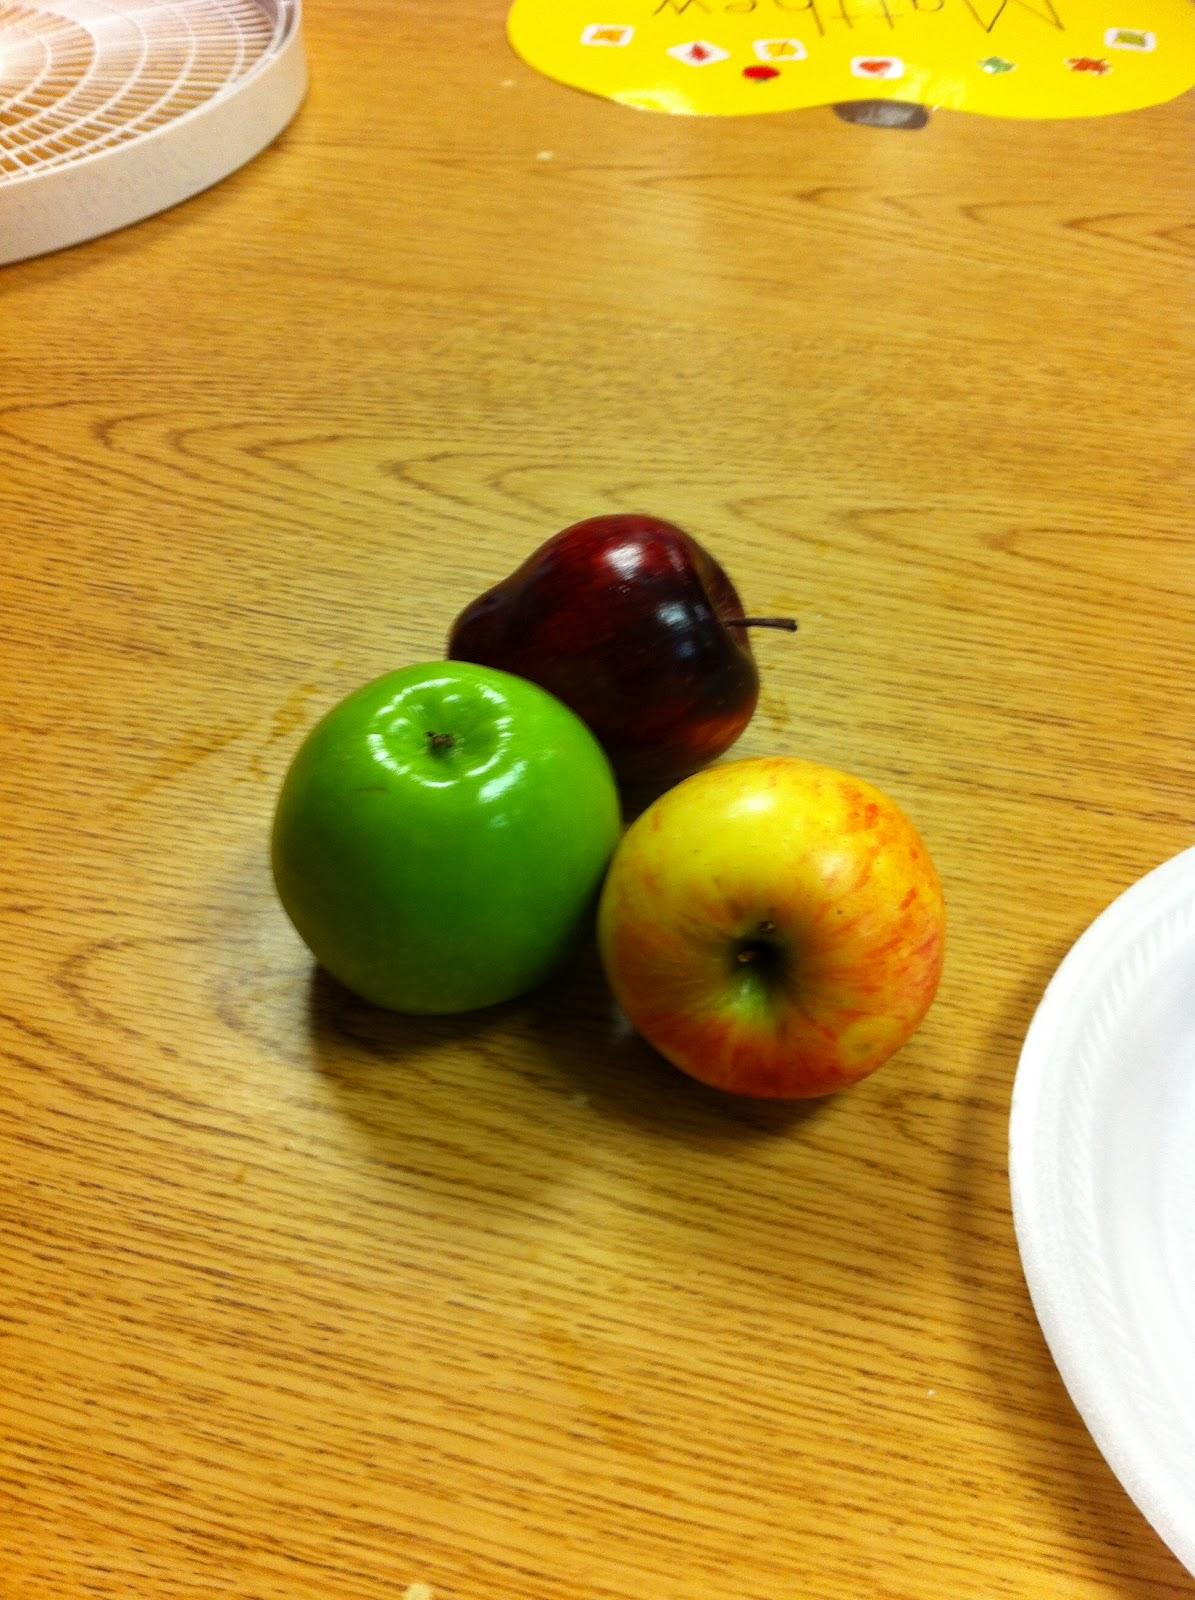 Caffine in apples